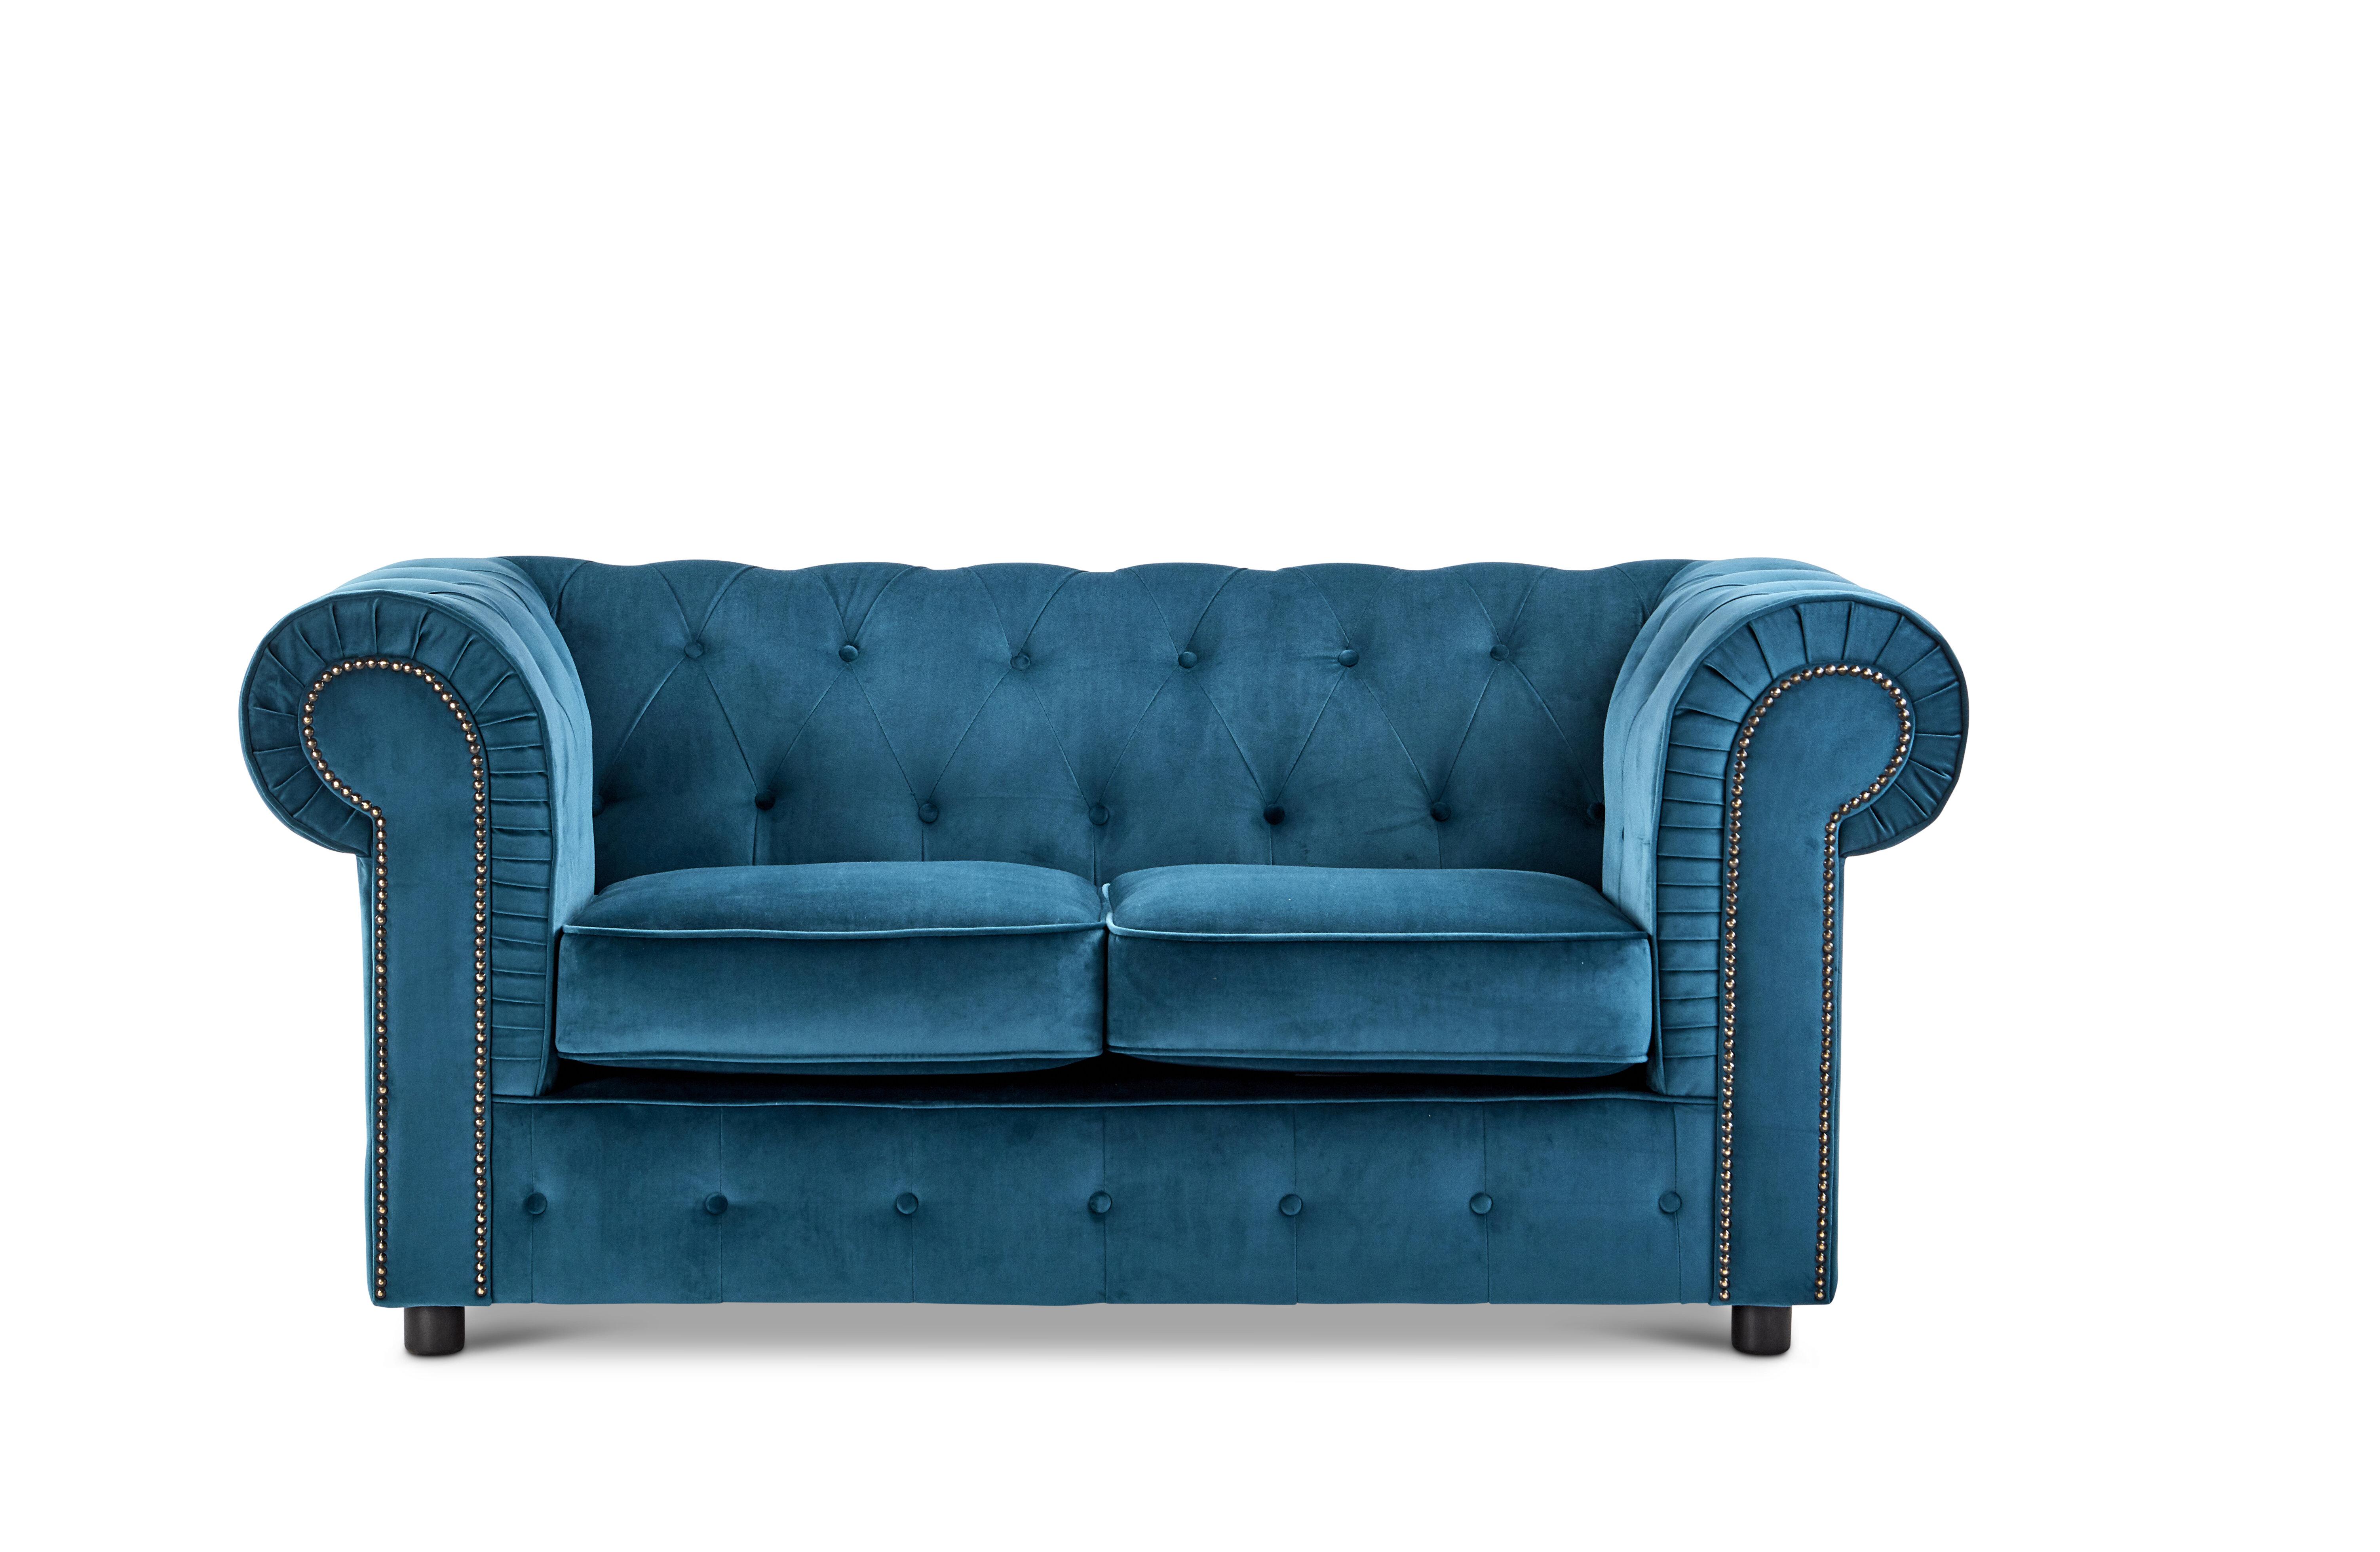 Willa Arlo Interiors Aaron 2 Seater Chesterfield Sofa Reviews Wayfair Co Uk